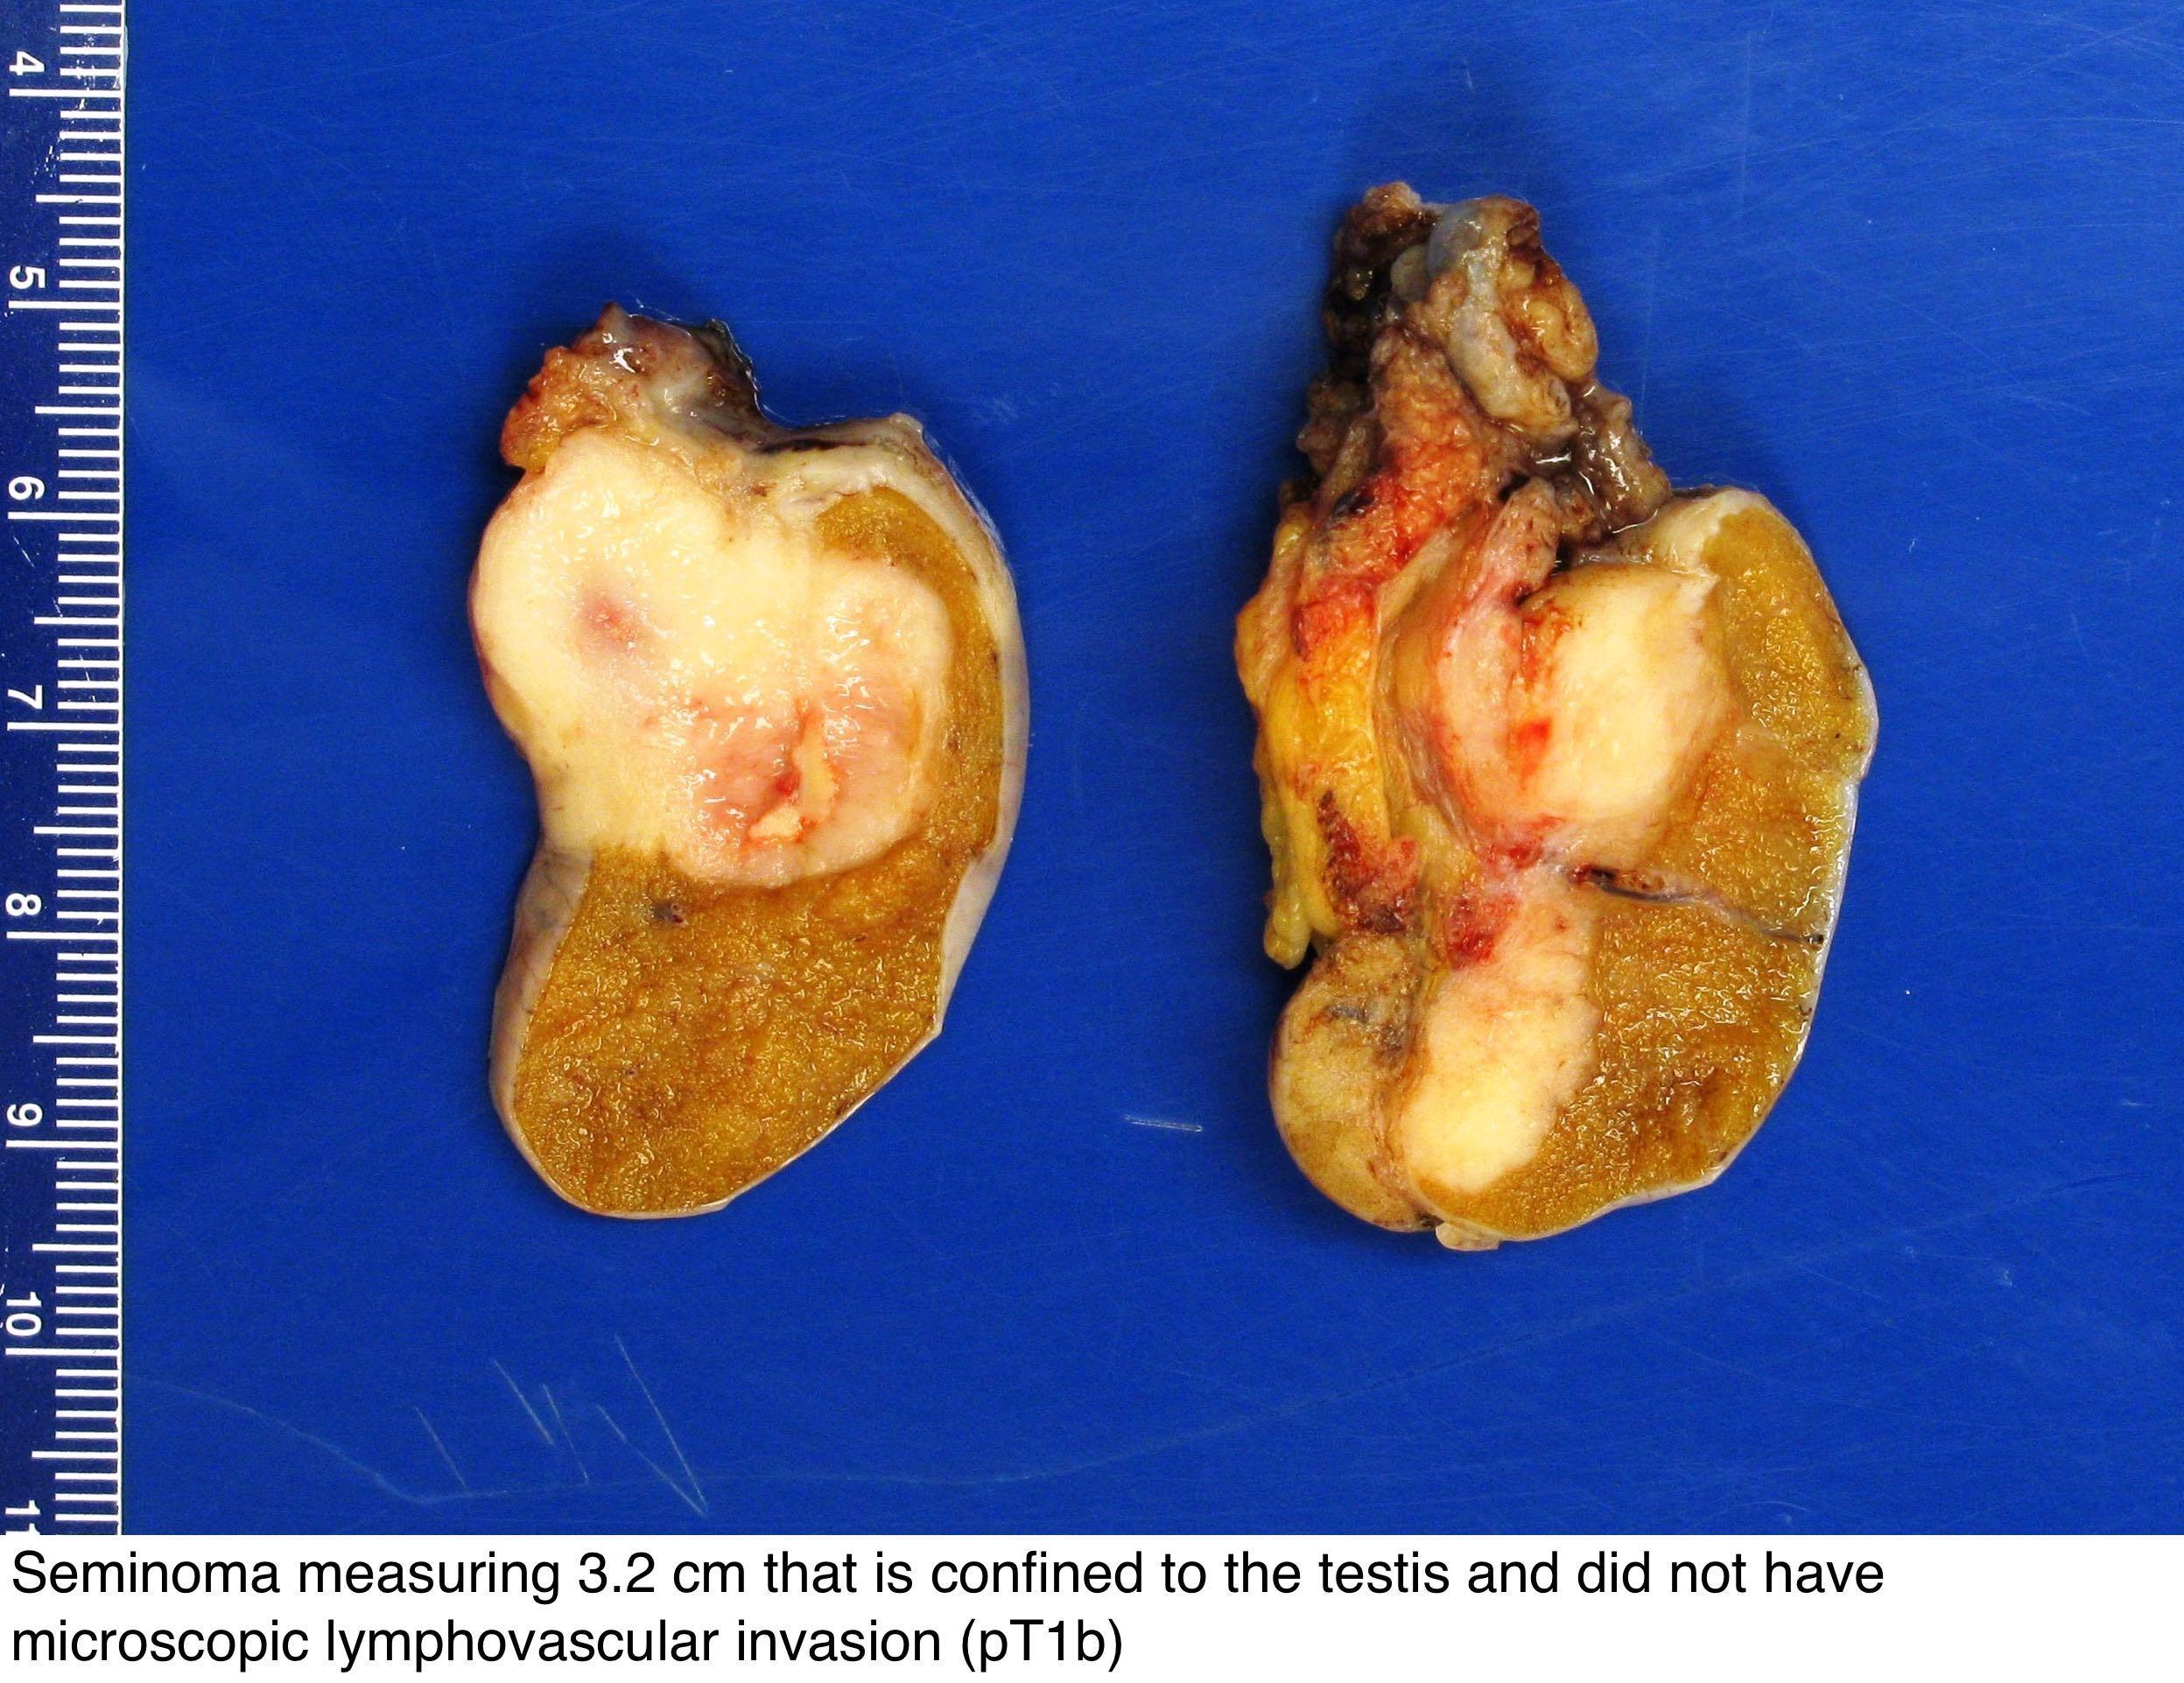 human papillomavirus (hpv) nedir paraziti intestinali netratati